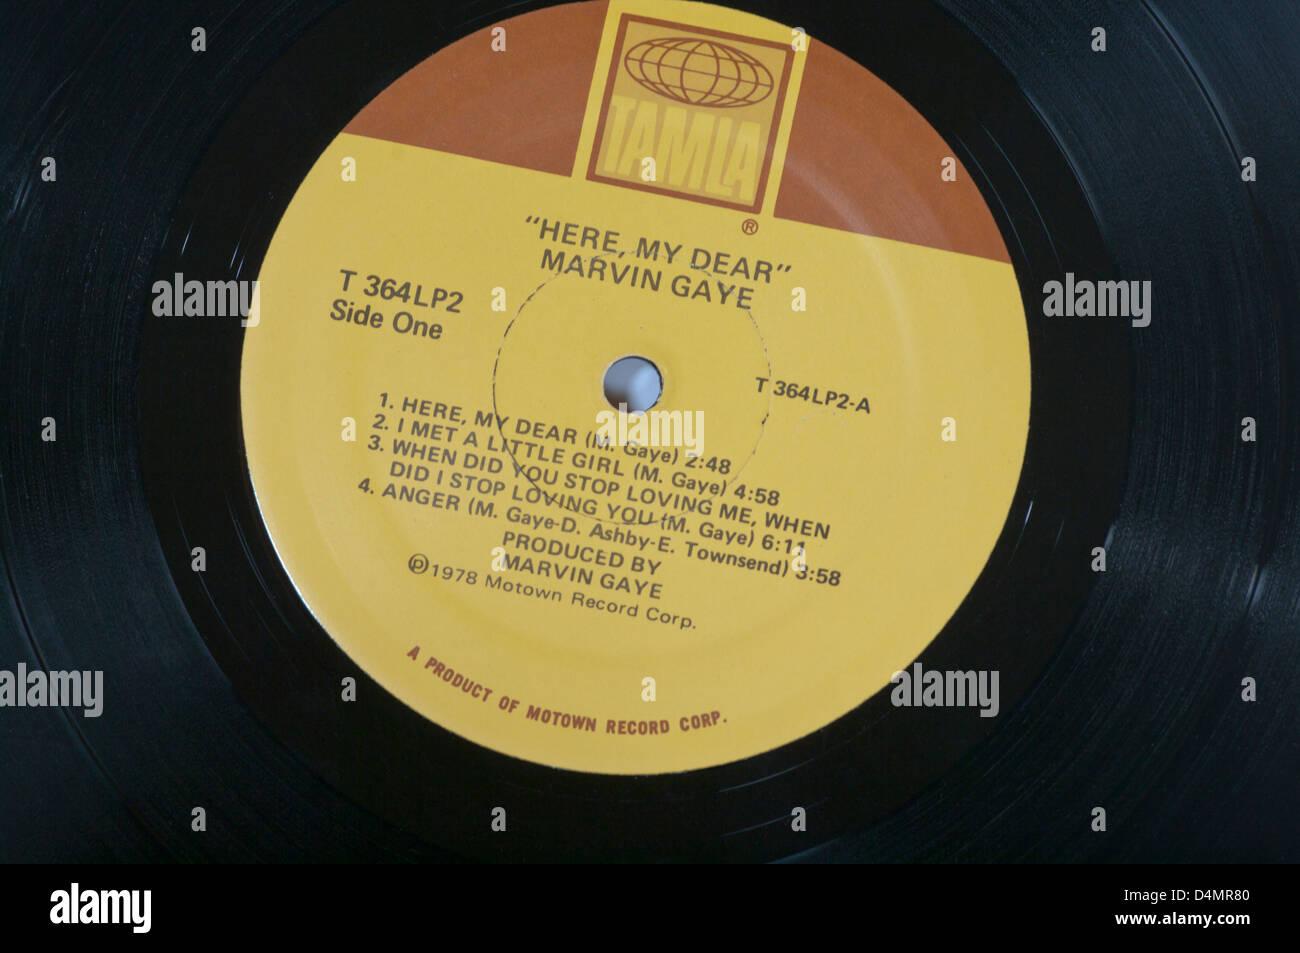 Tamla Record Label On A Vinyl Lp Record Stock Photo